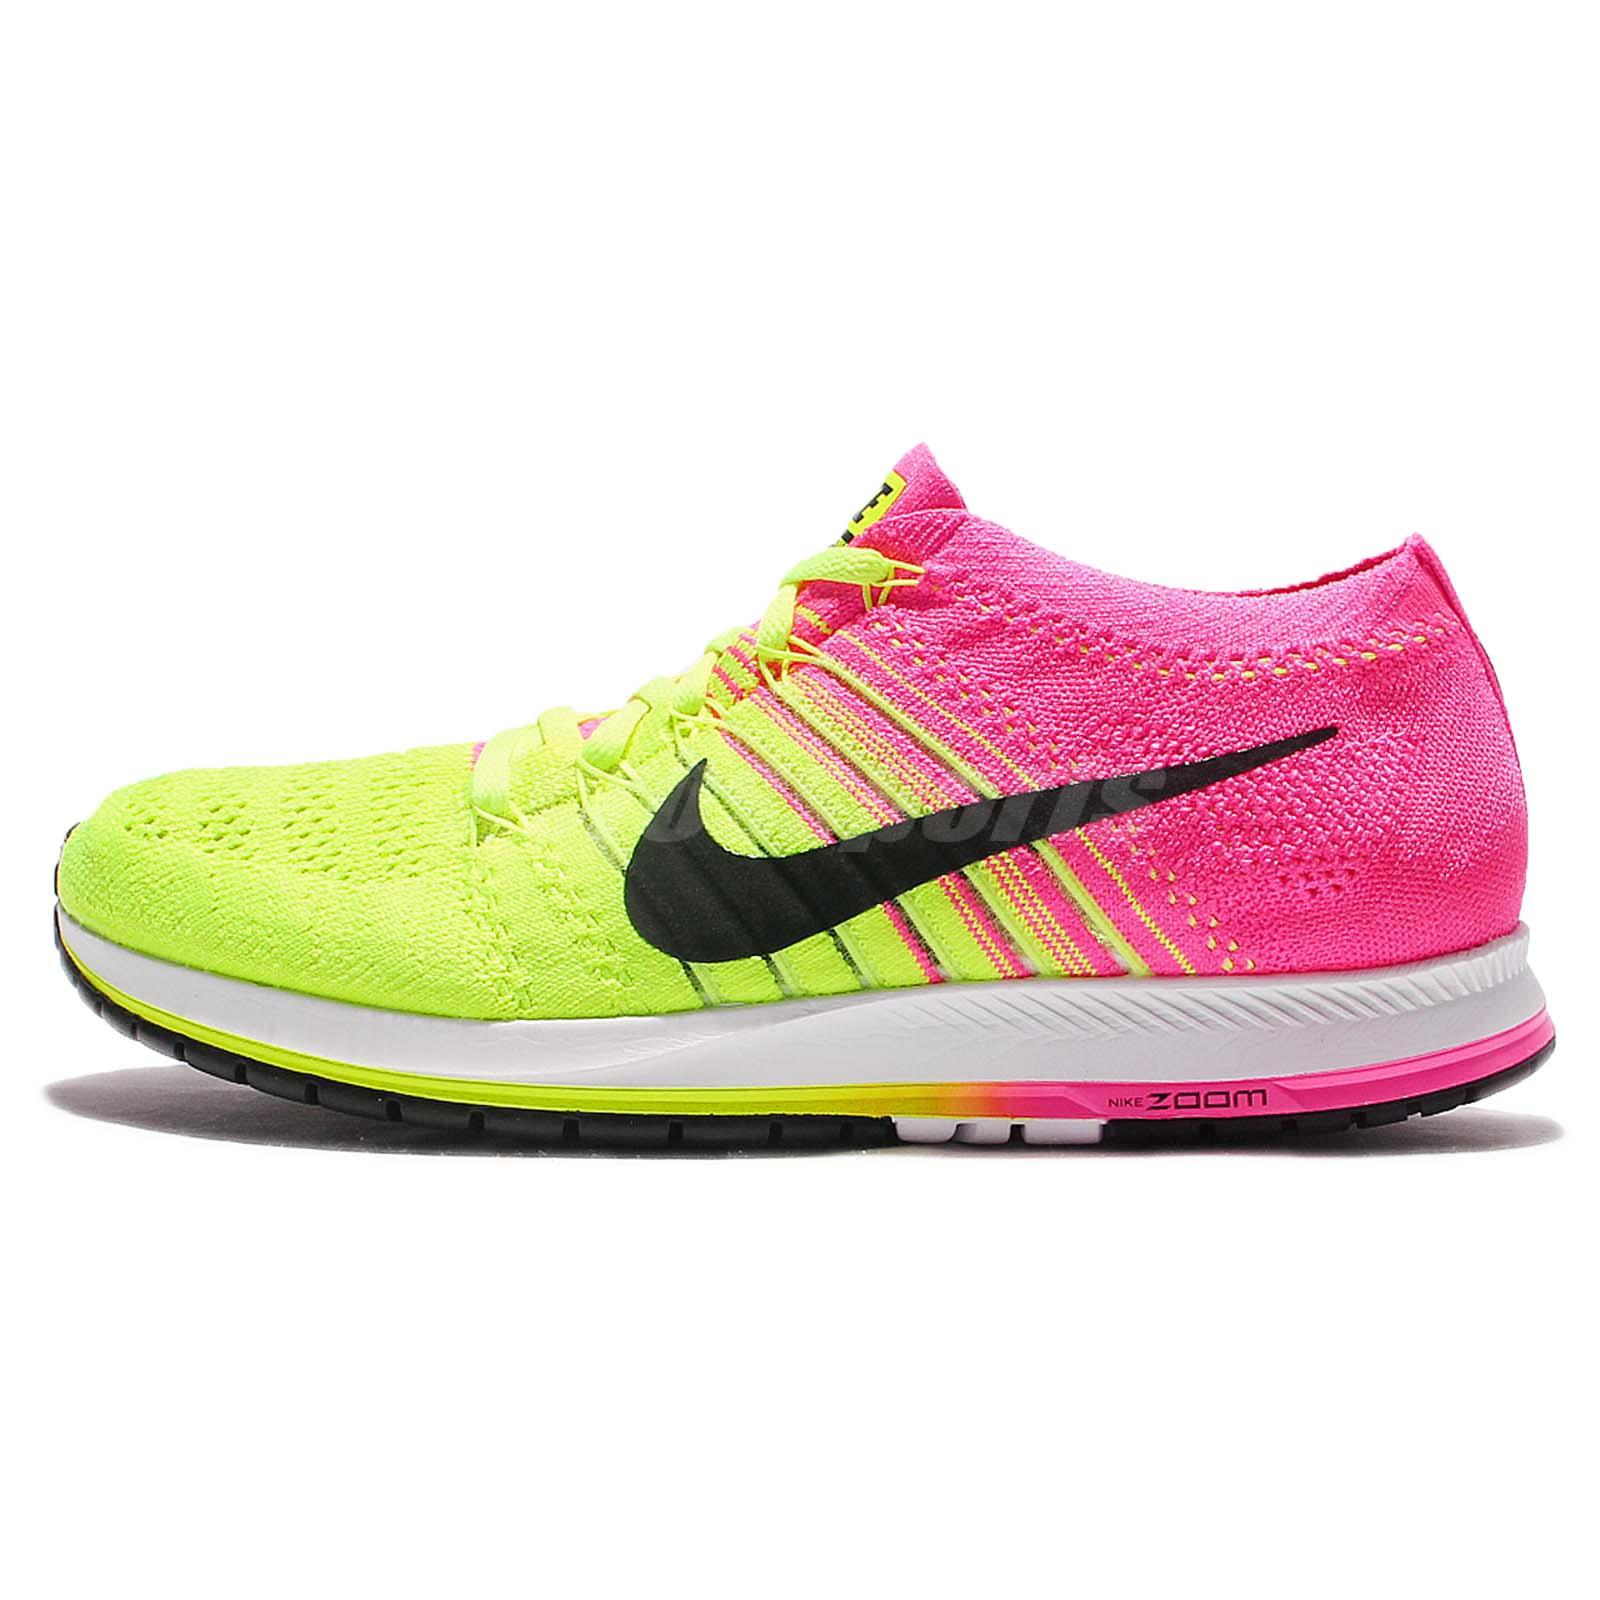 Nike Flyknit Streak OC Rio Olympics Multi-Color Mens Running Shoes 844797- 999